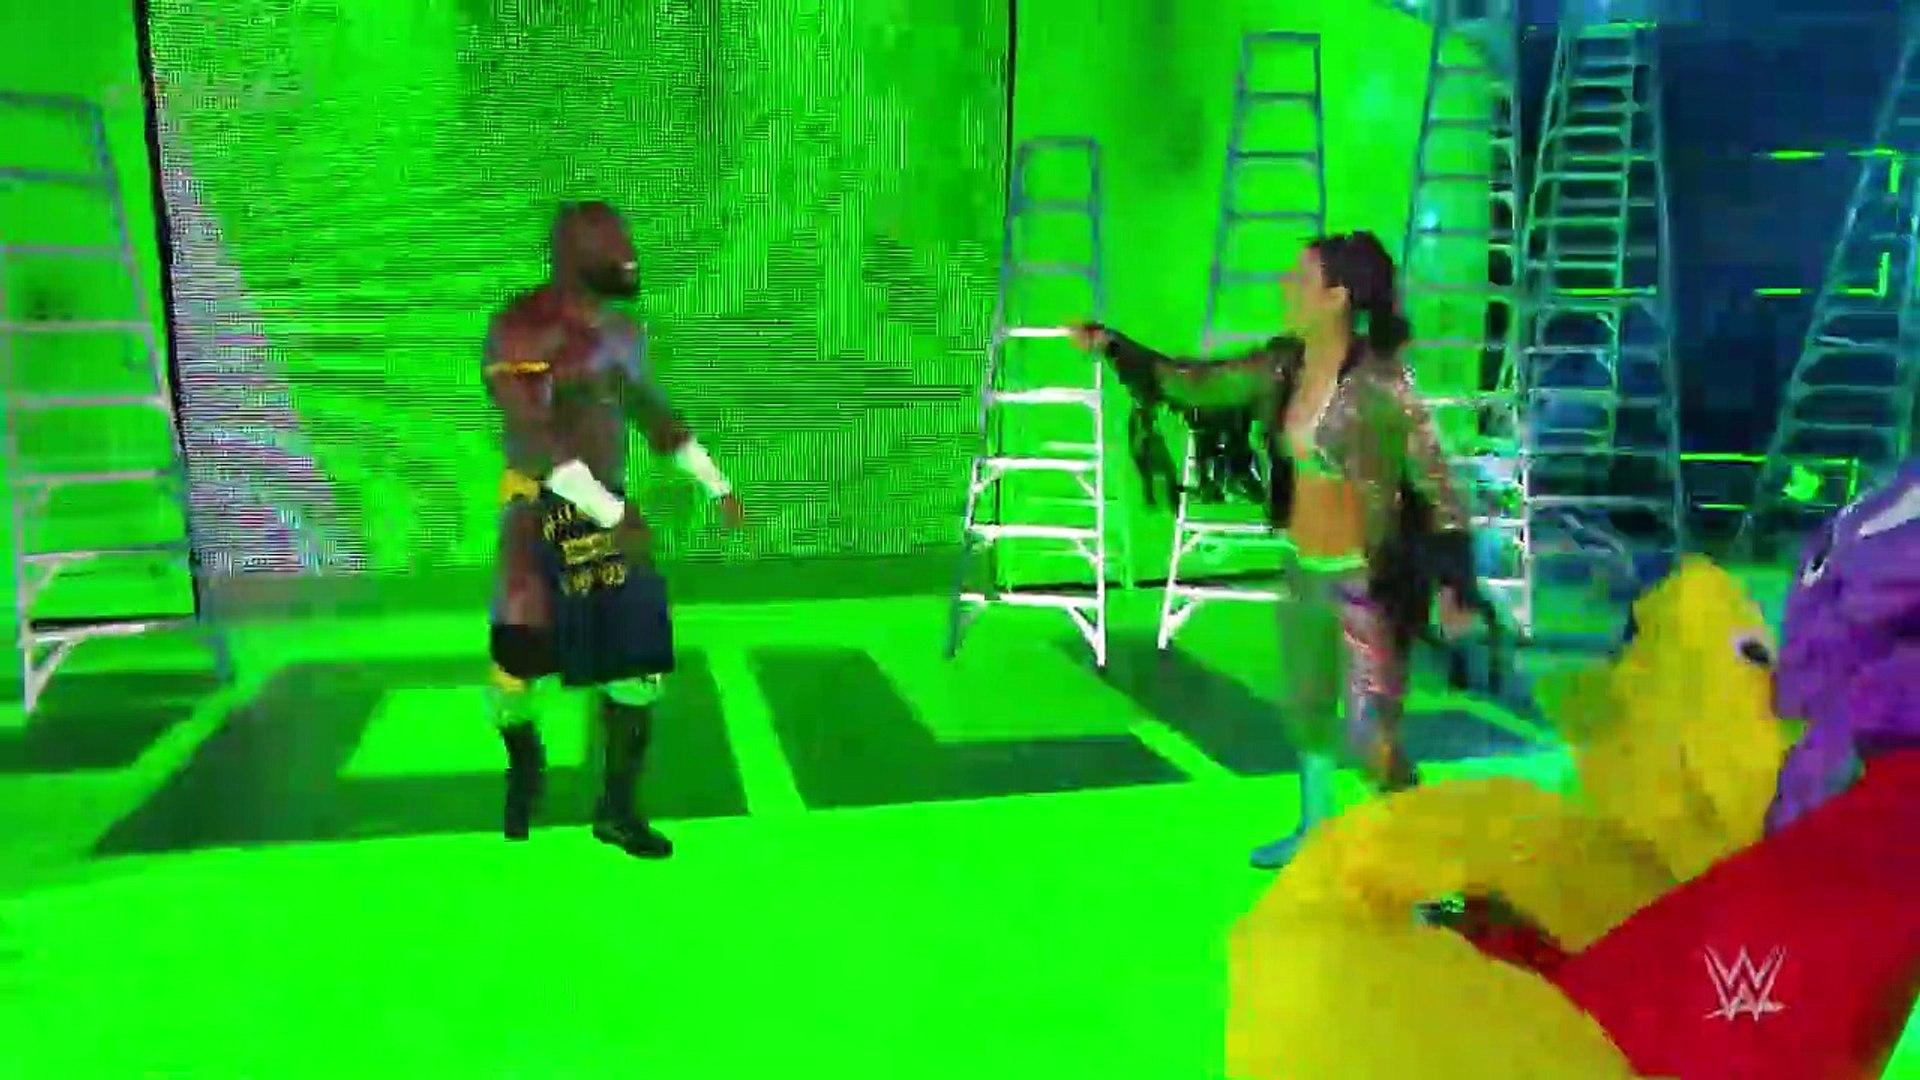 Watch WWE Mixed Match Challenge Season 2 Episode 13 - 11th December 2018 Full Show